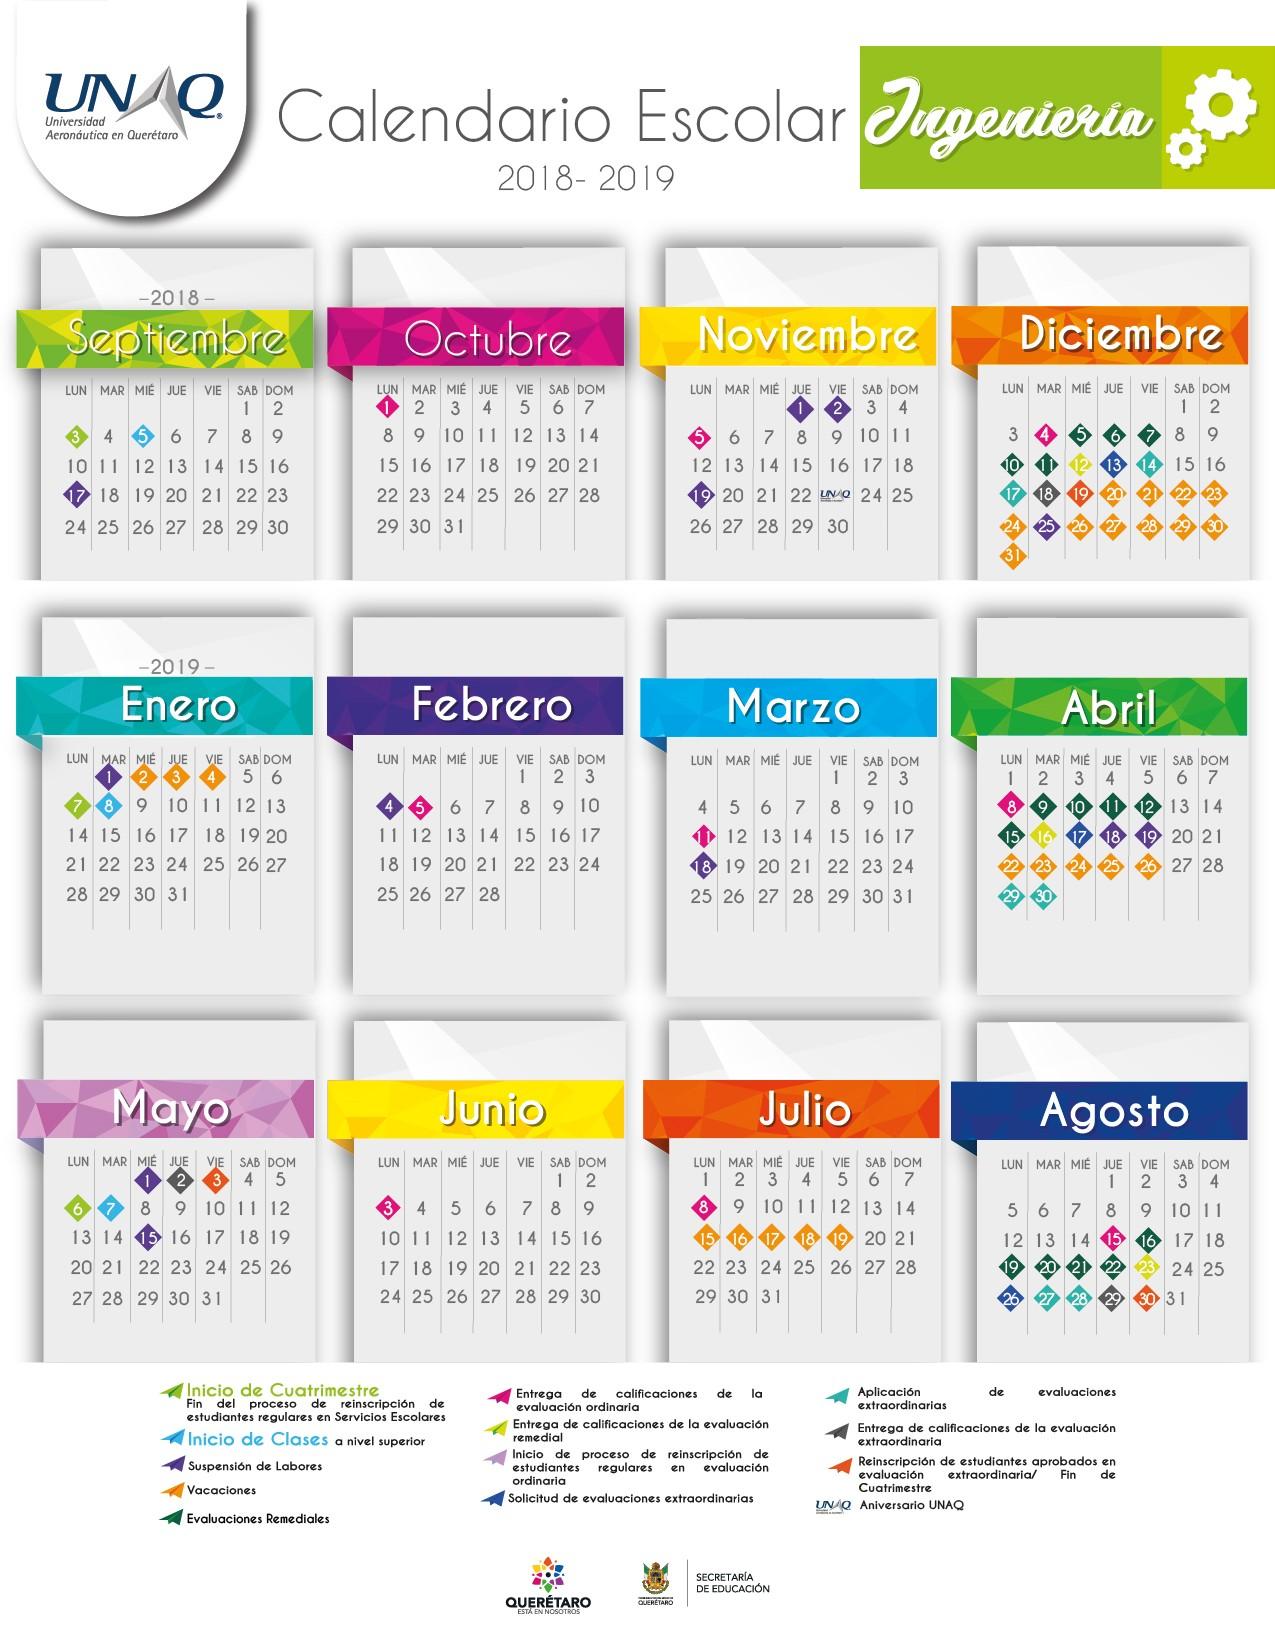 Calendario Escolar 2019-1 Fes Aragón Más Arriba-a-fecha Unaq Calendario Escolar Of Calendario Escolar 2019-1 Fes Aragón Más Recientemente Liberado Calendario Escolar 2018 2019 Más De 100 Plantillas E